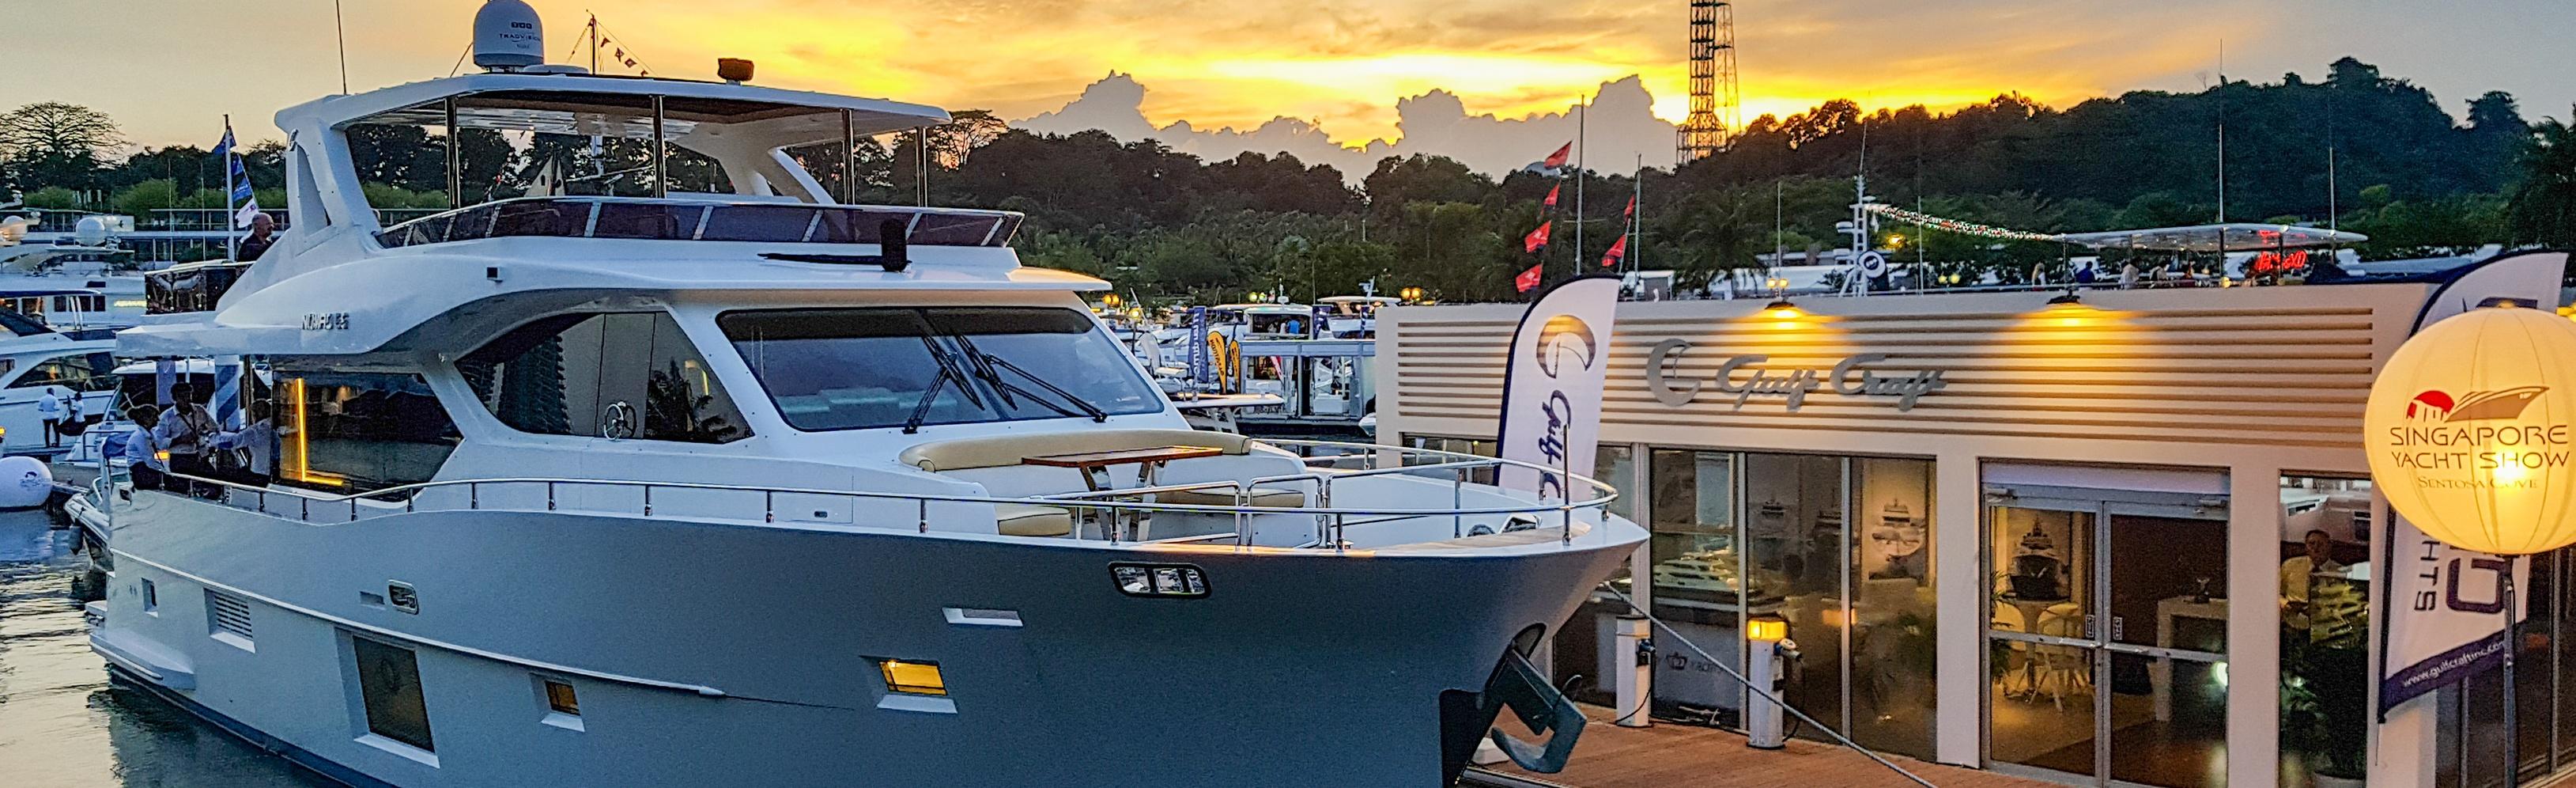 Gulf-Craft,-Singapore-Yacht-Show-2018-3